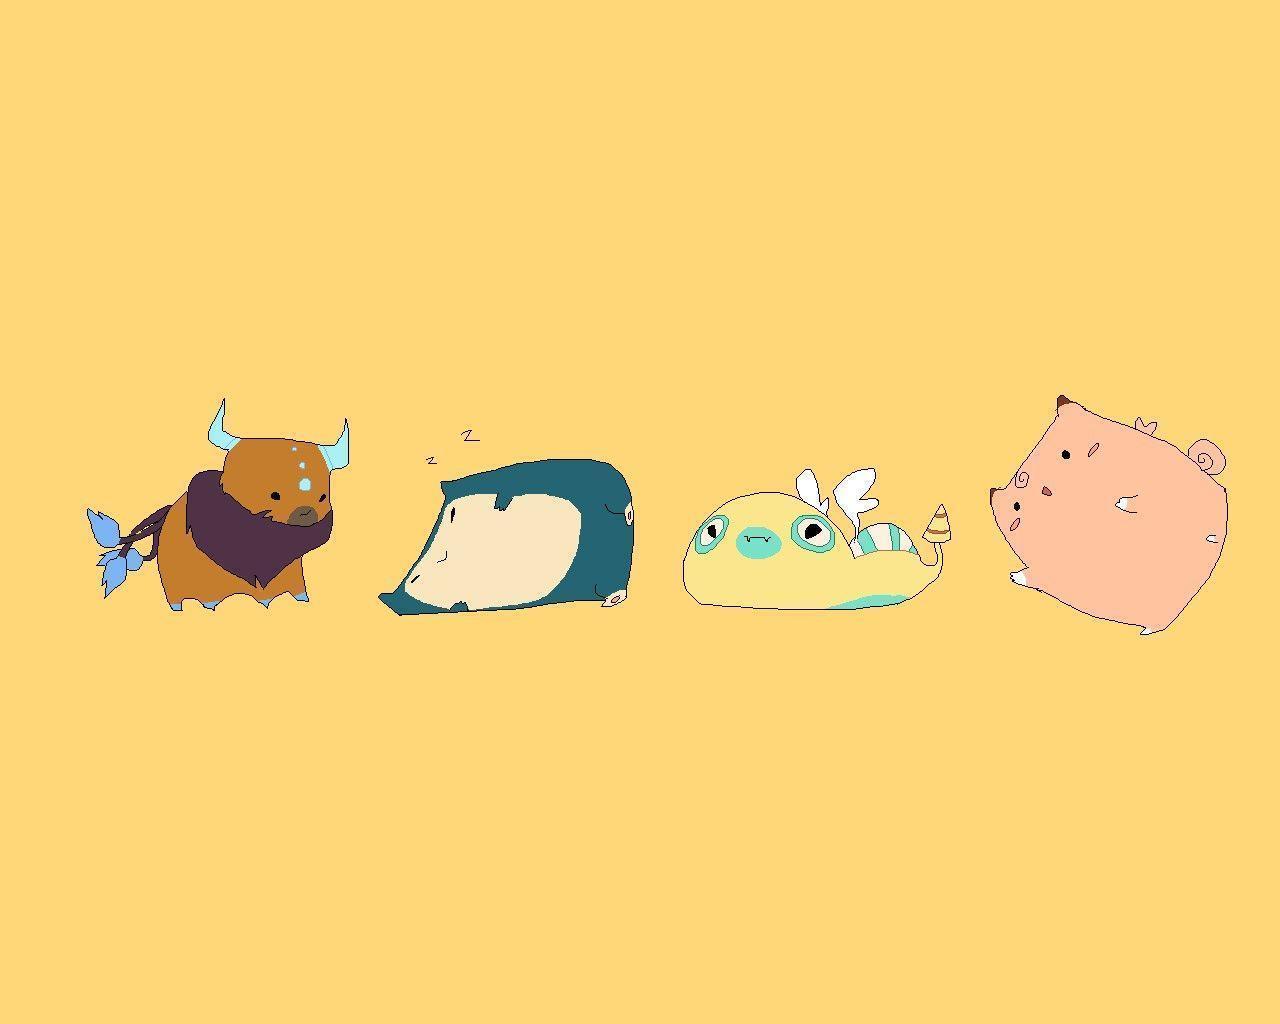 cute pokemon wallpaper 5599 - photo #24